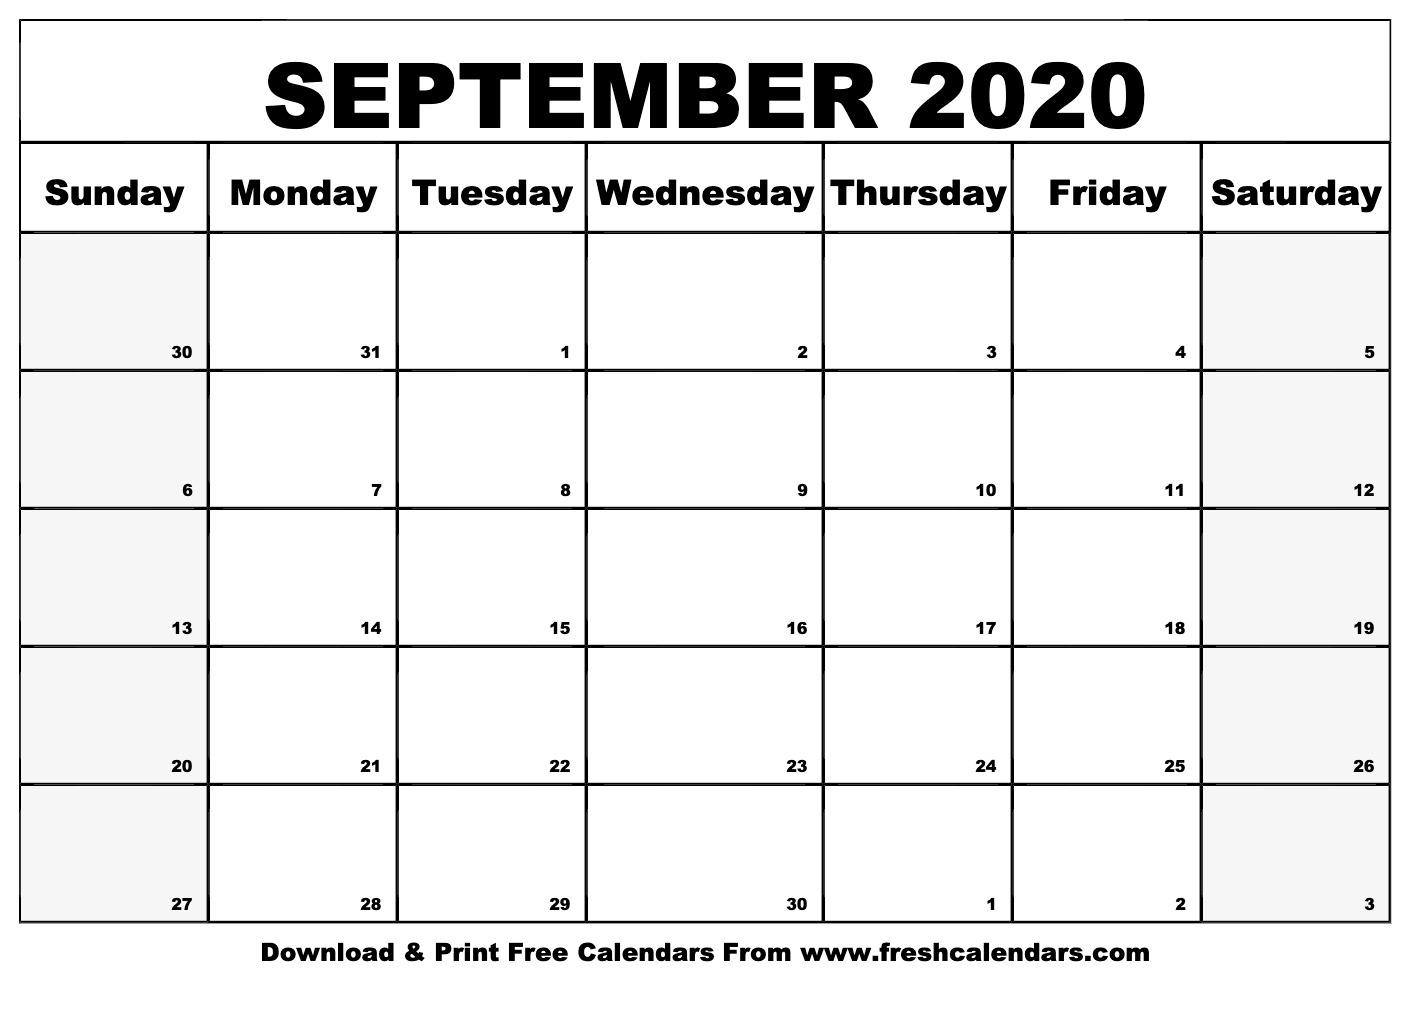 Free Editable Printable September 2020 Week Start With